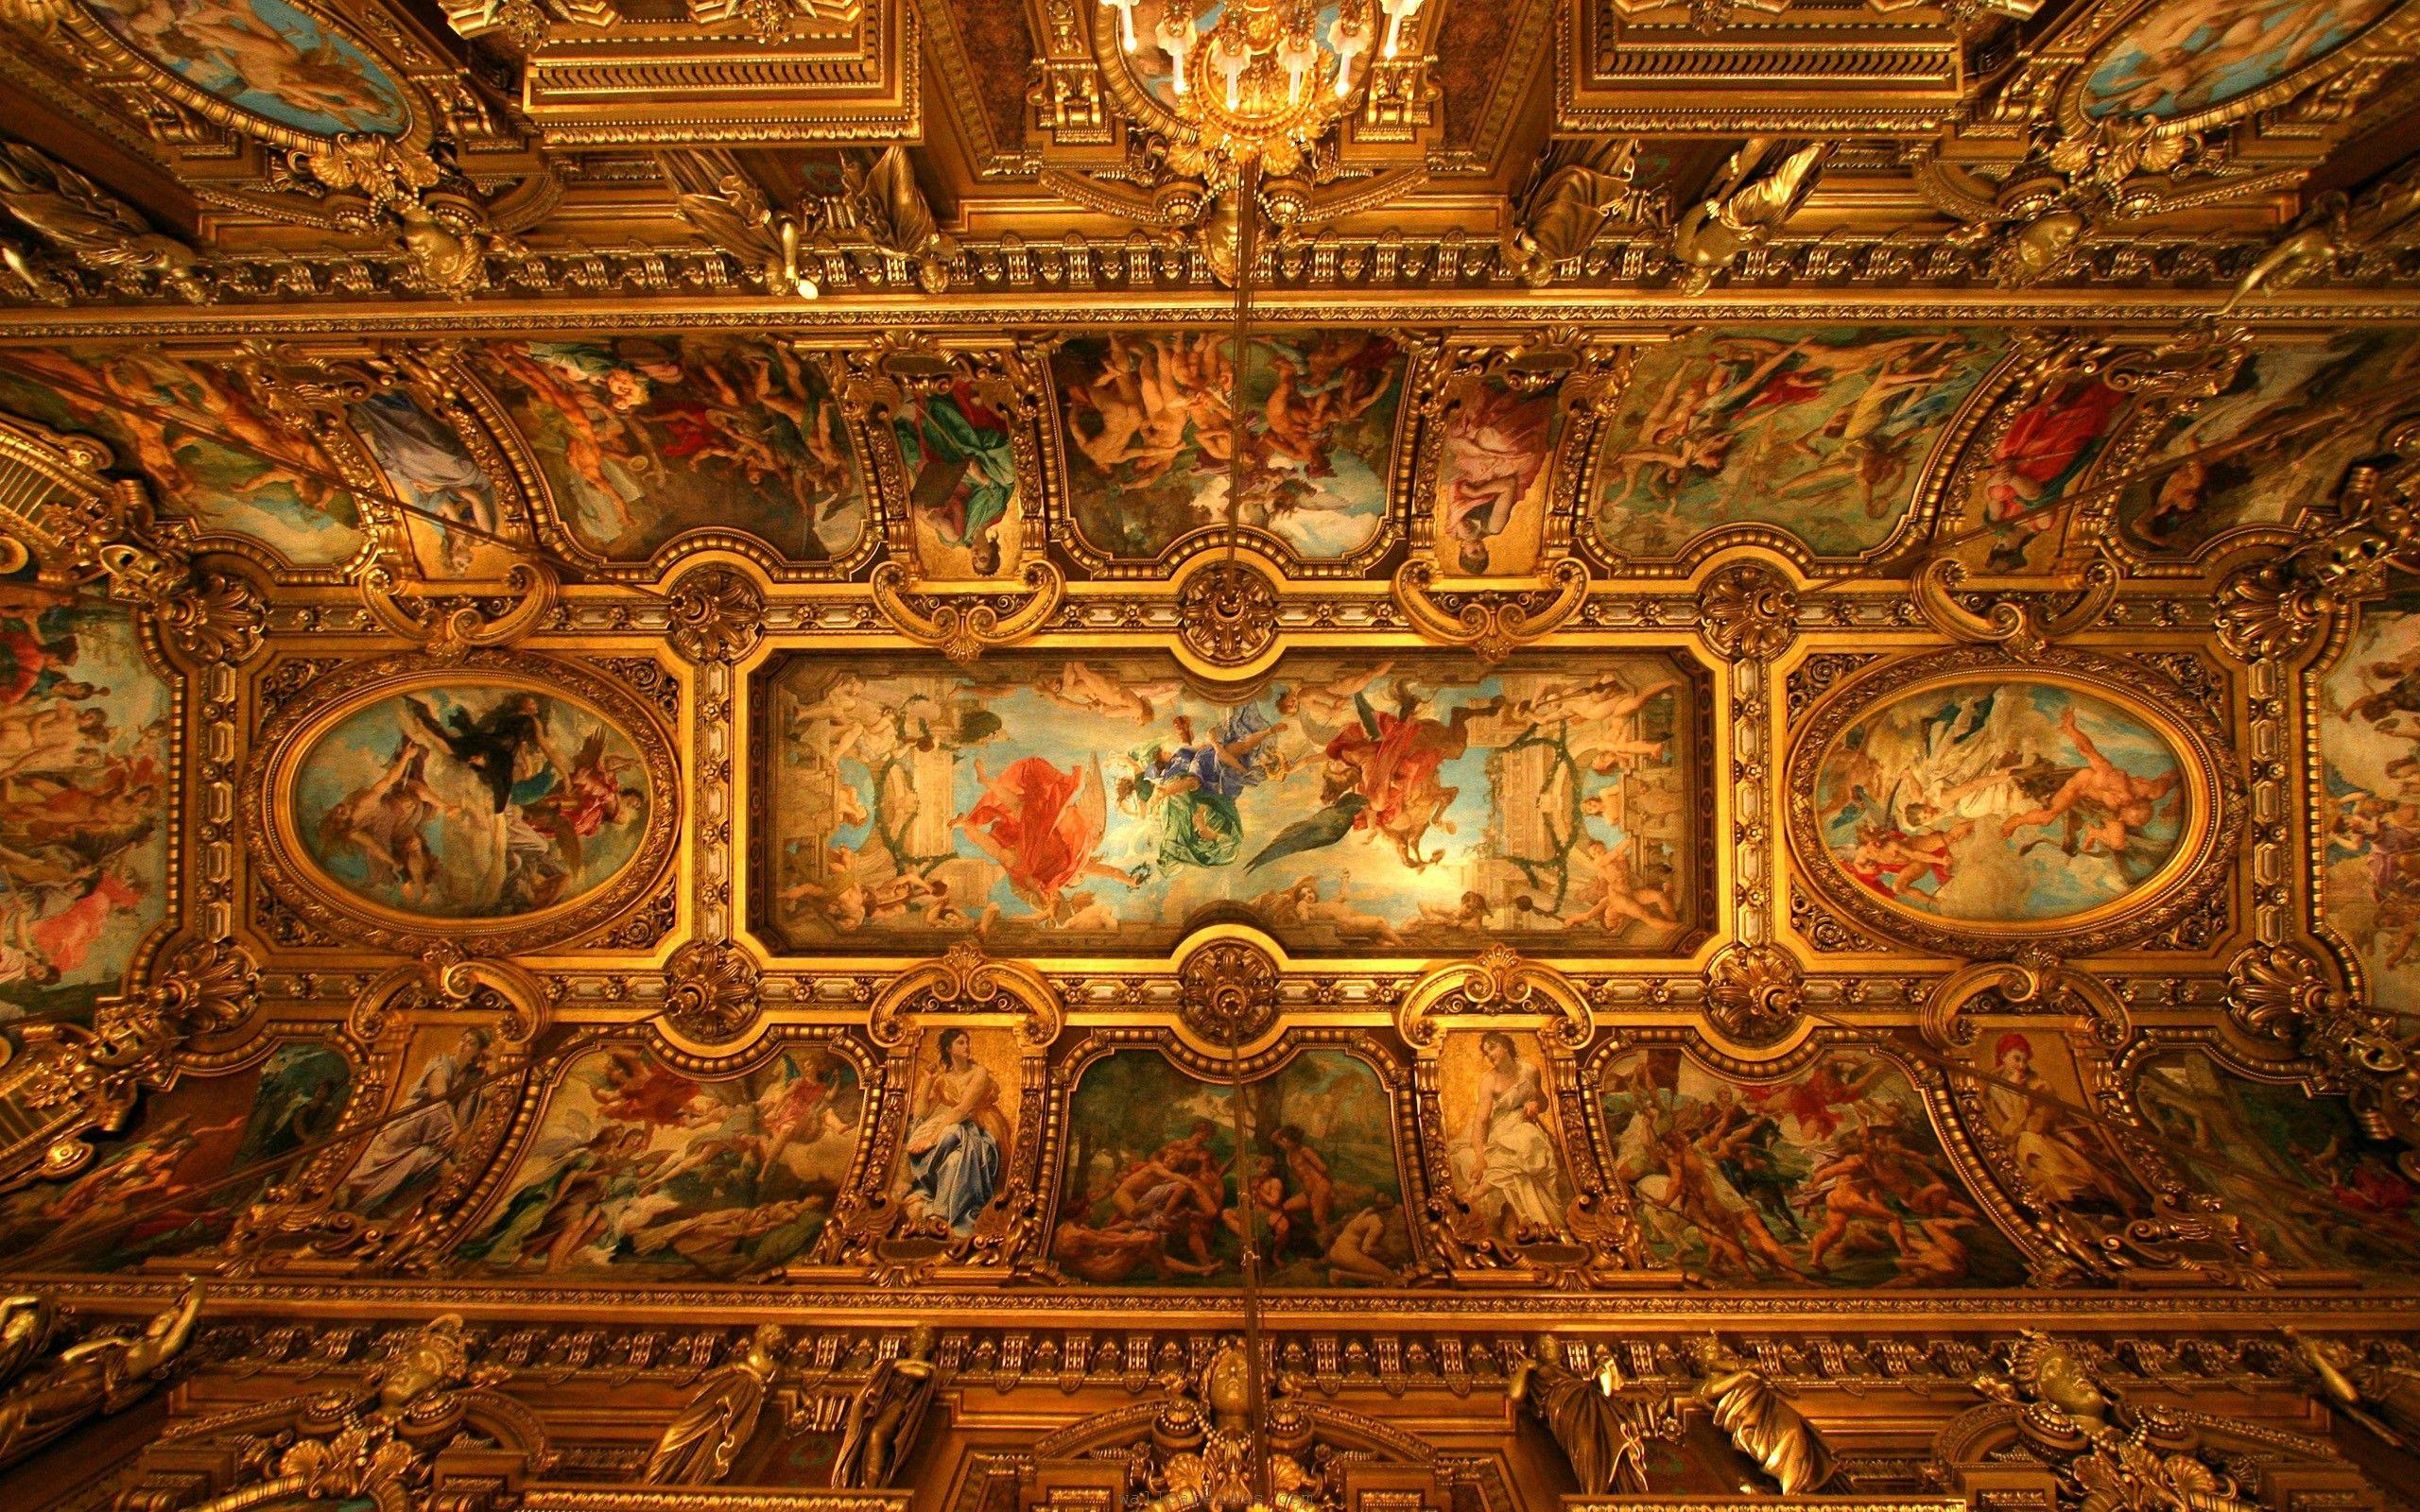 Michelangelo Wallpapers HD   Wallpapers   Pinterest ...